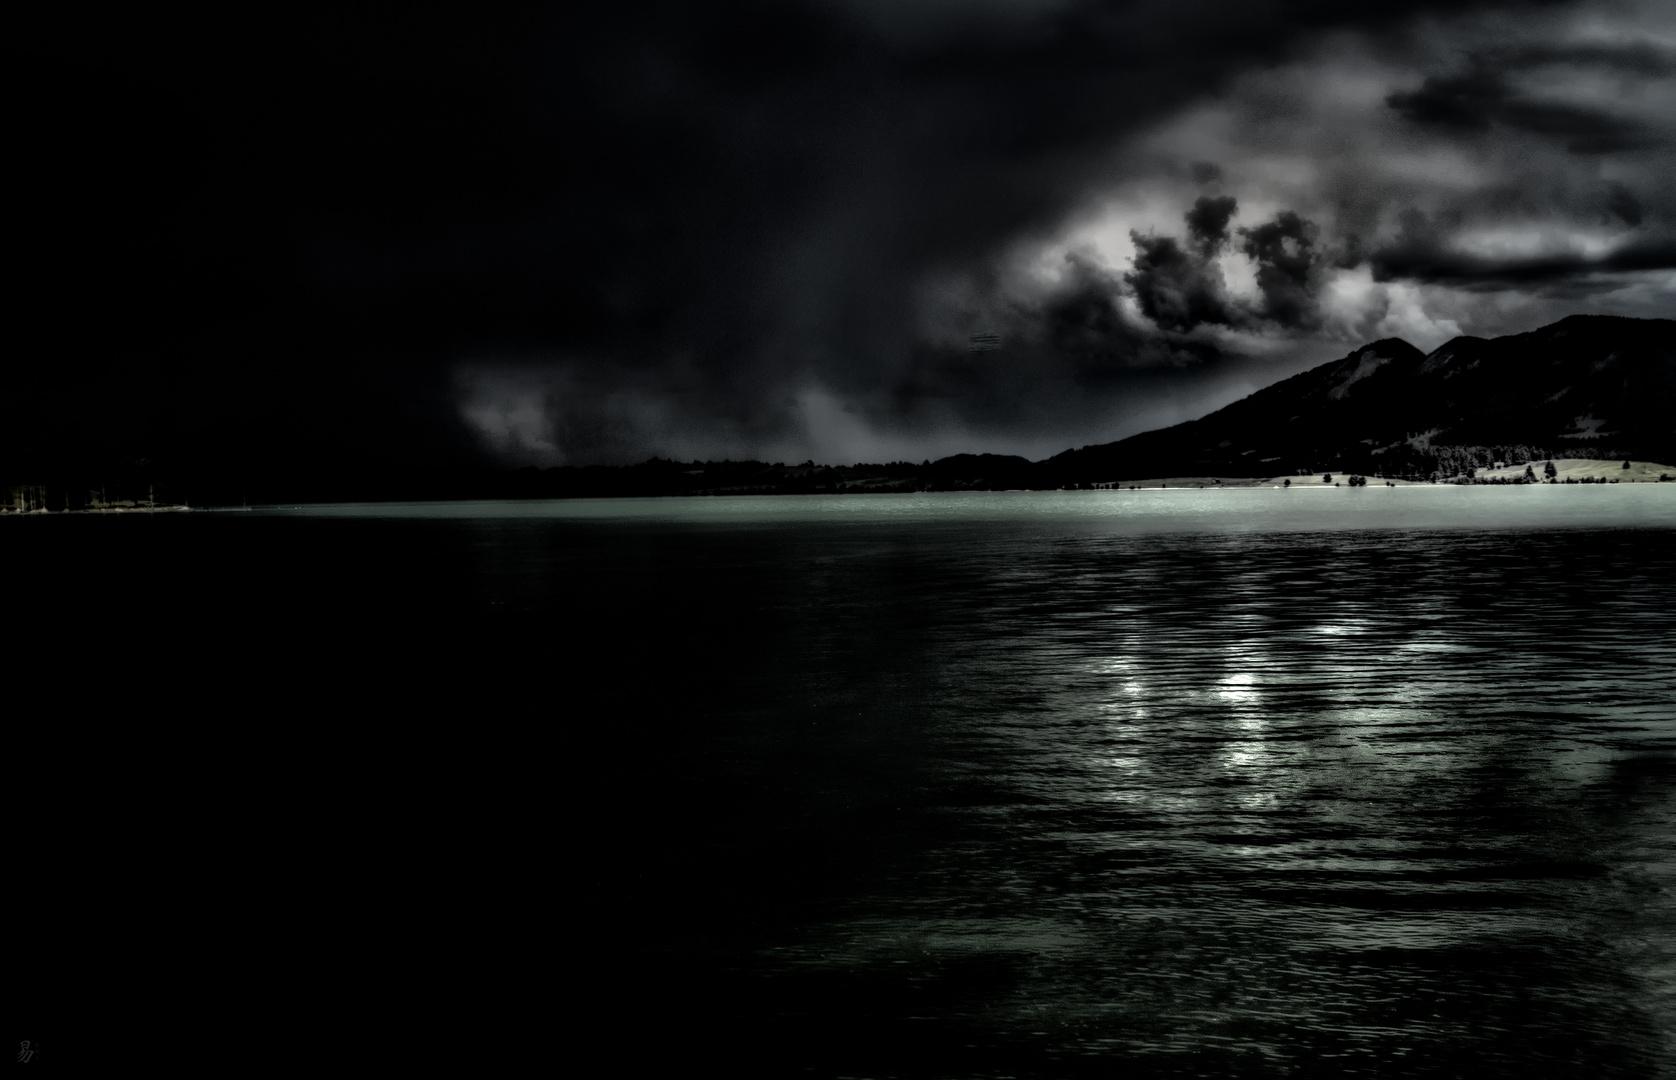 night fall over the lake